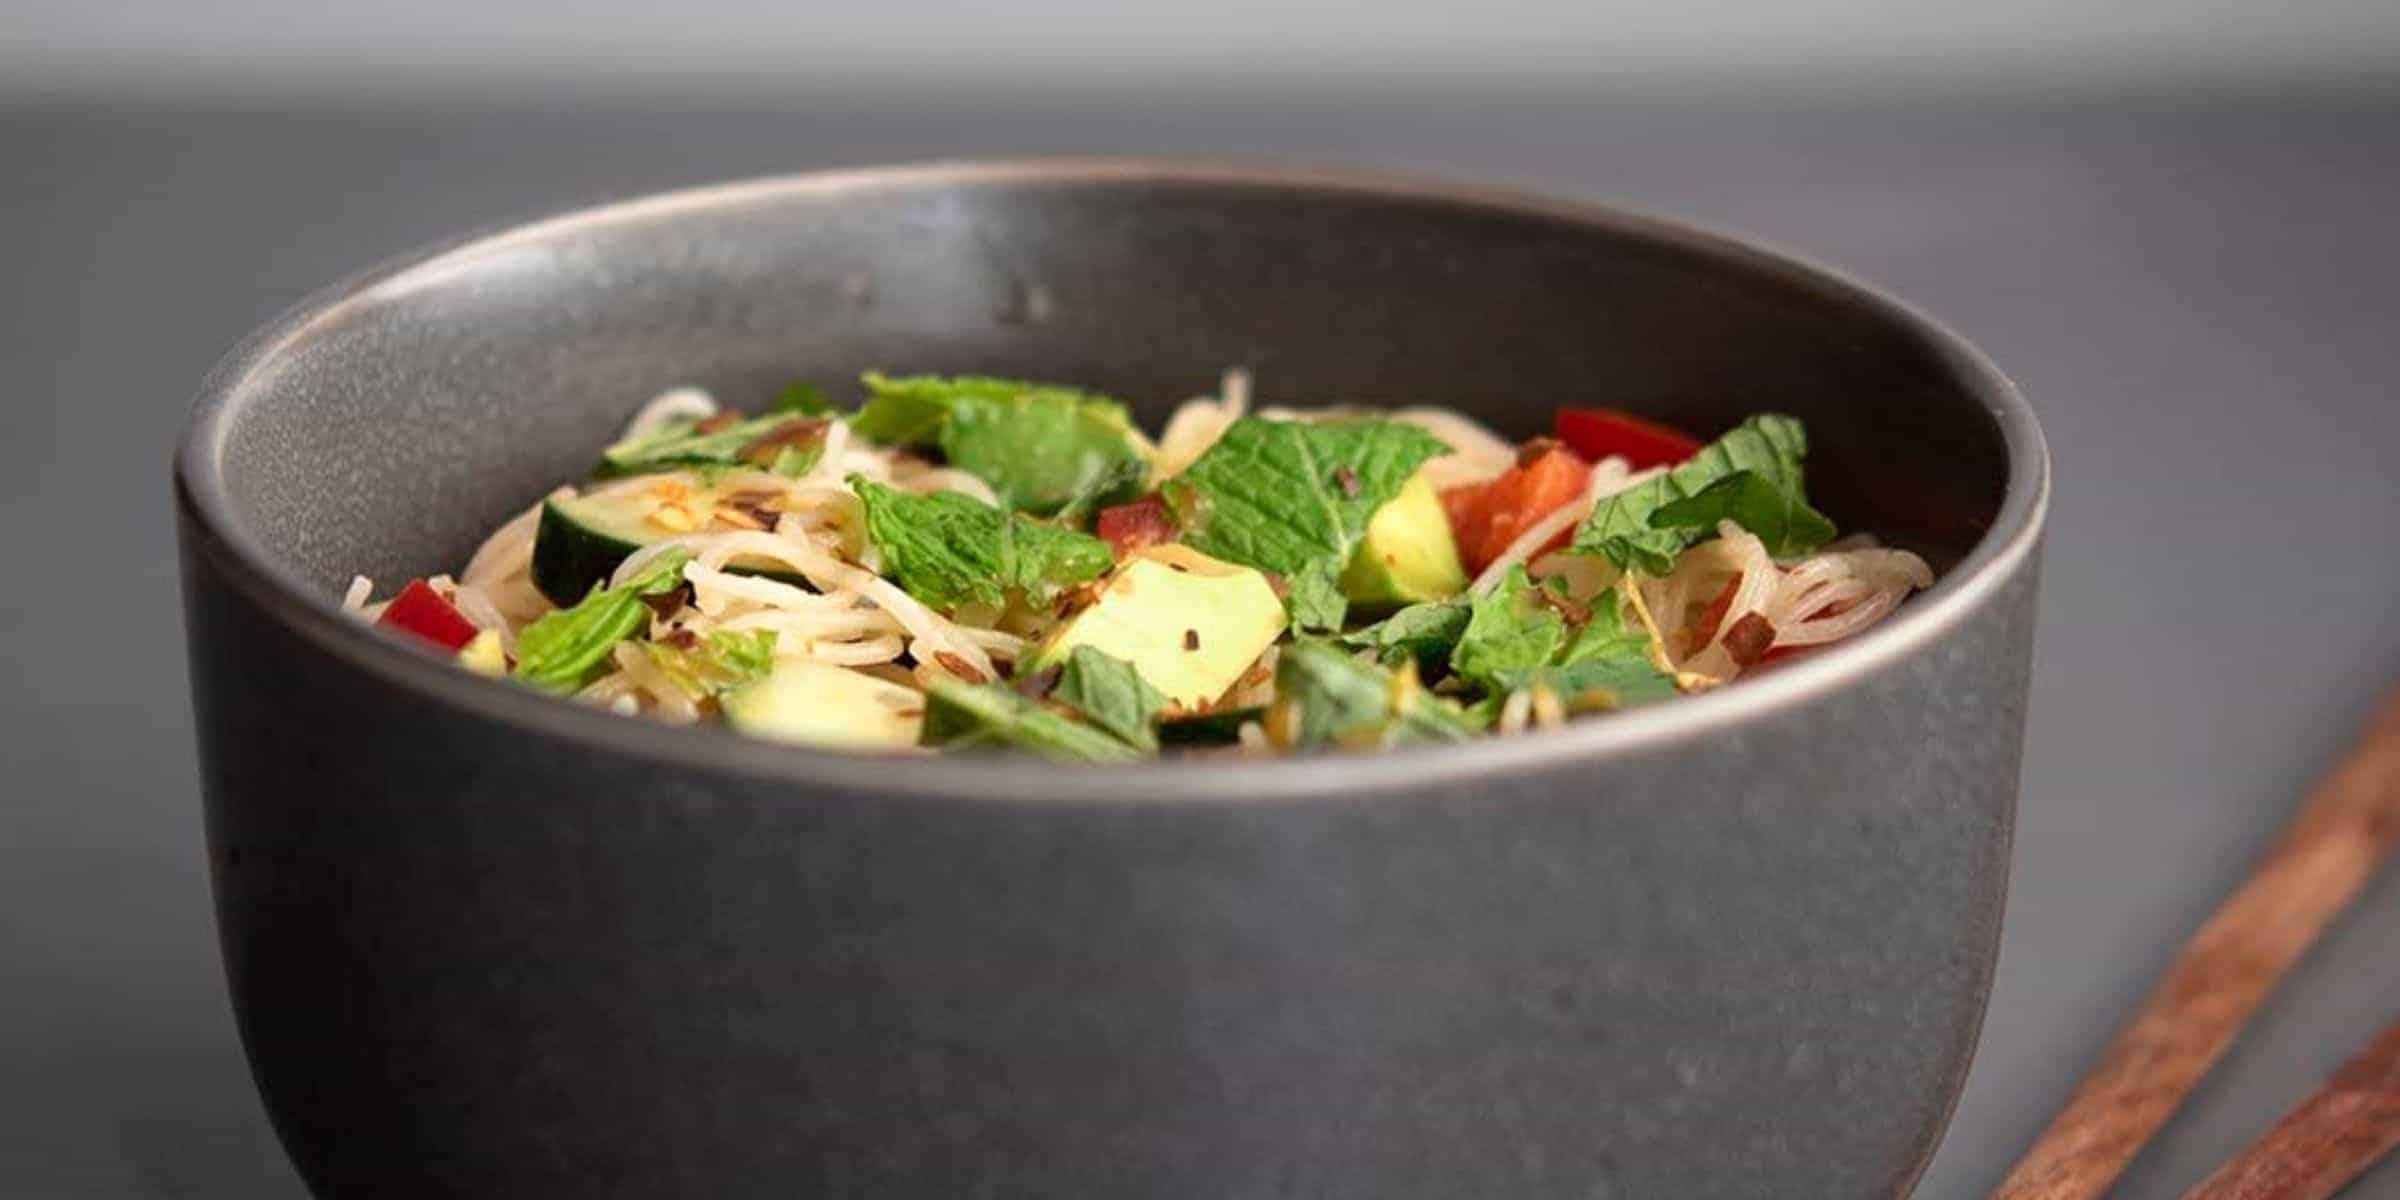 Vegan Thai Noodle Salad with Sweet Chili Vinaigrette